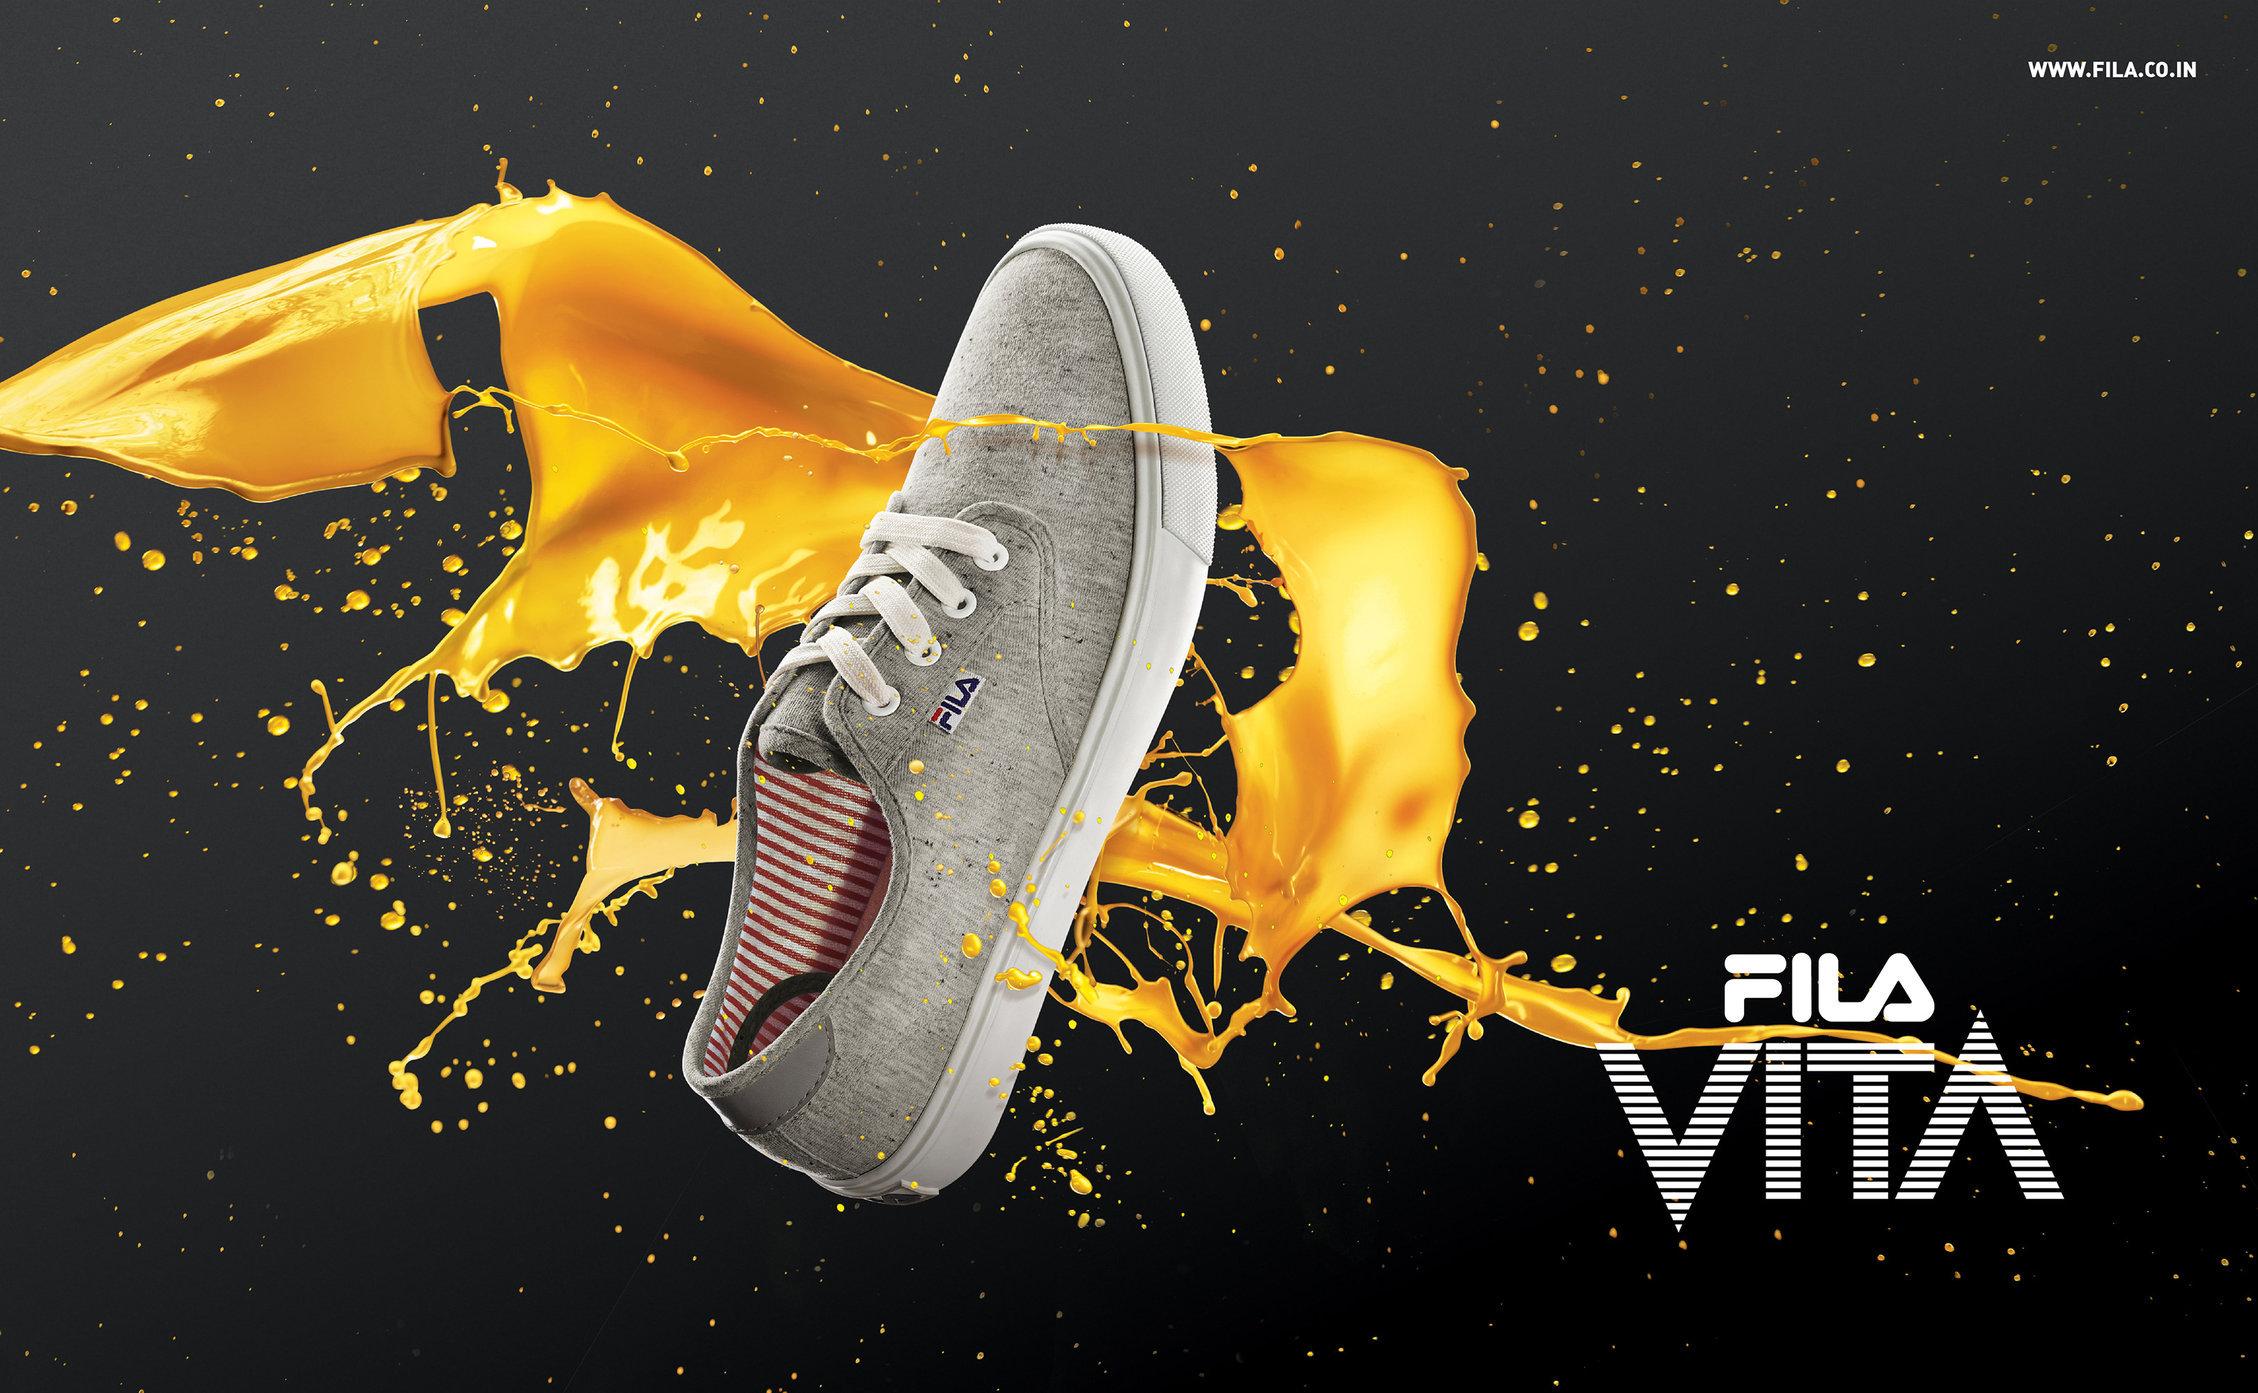 Fila SS17 Ad campaign 2.jpg